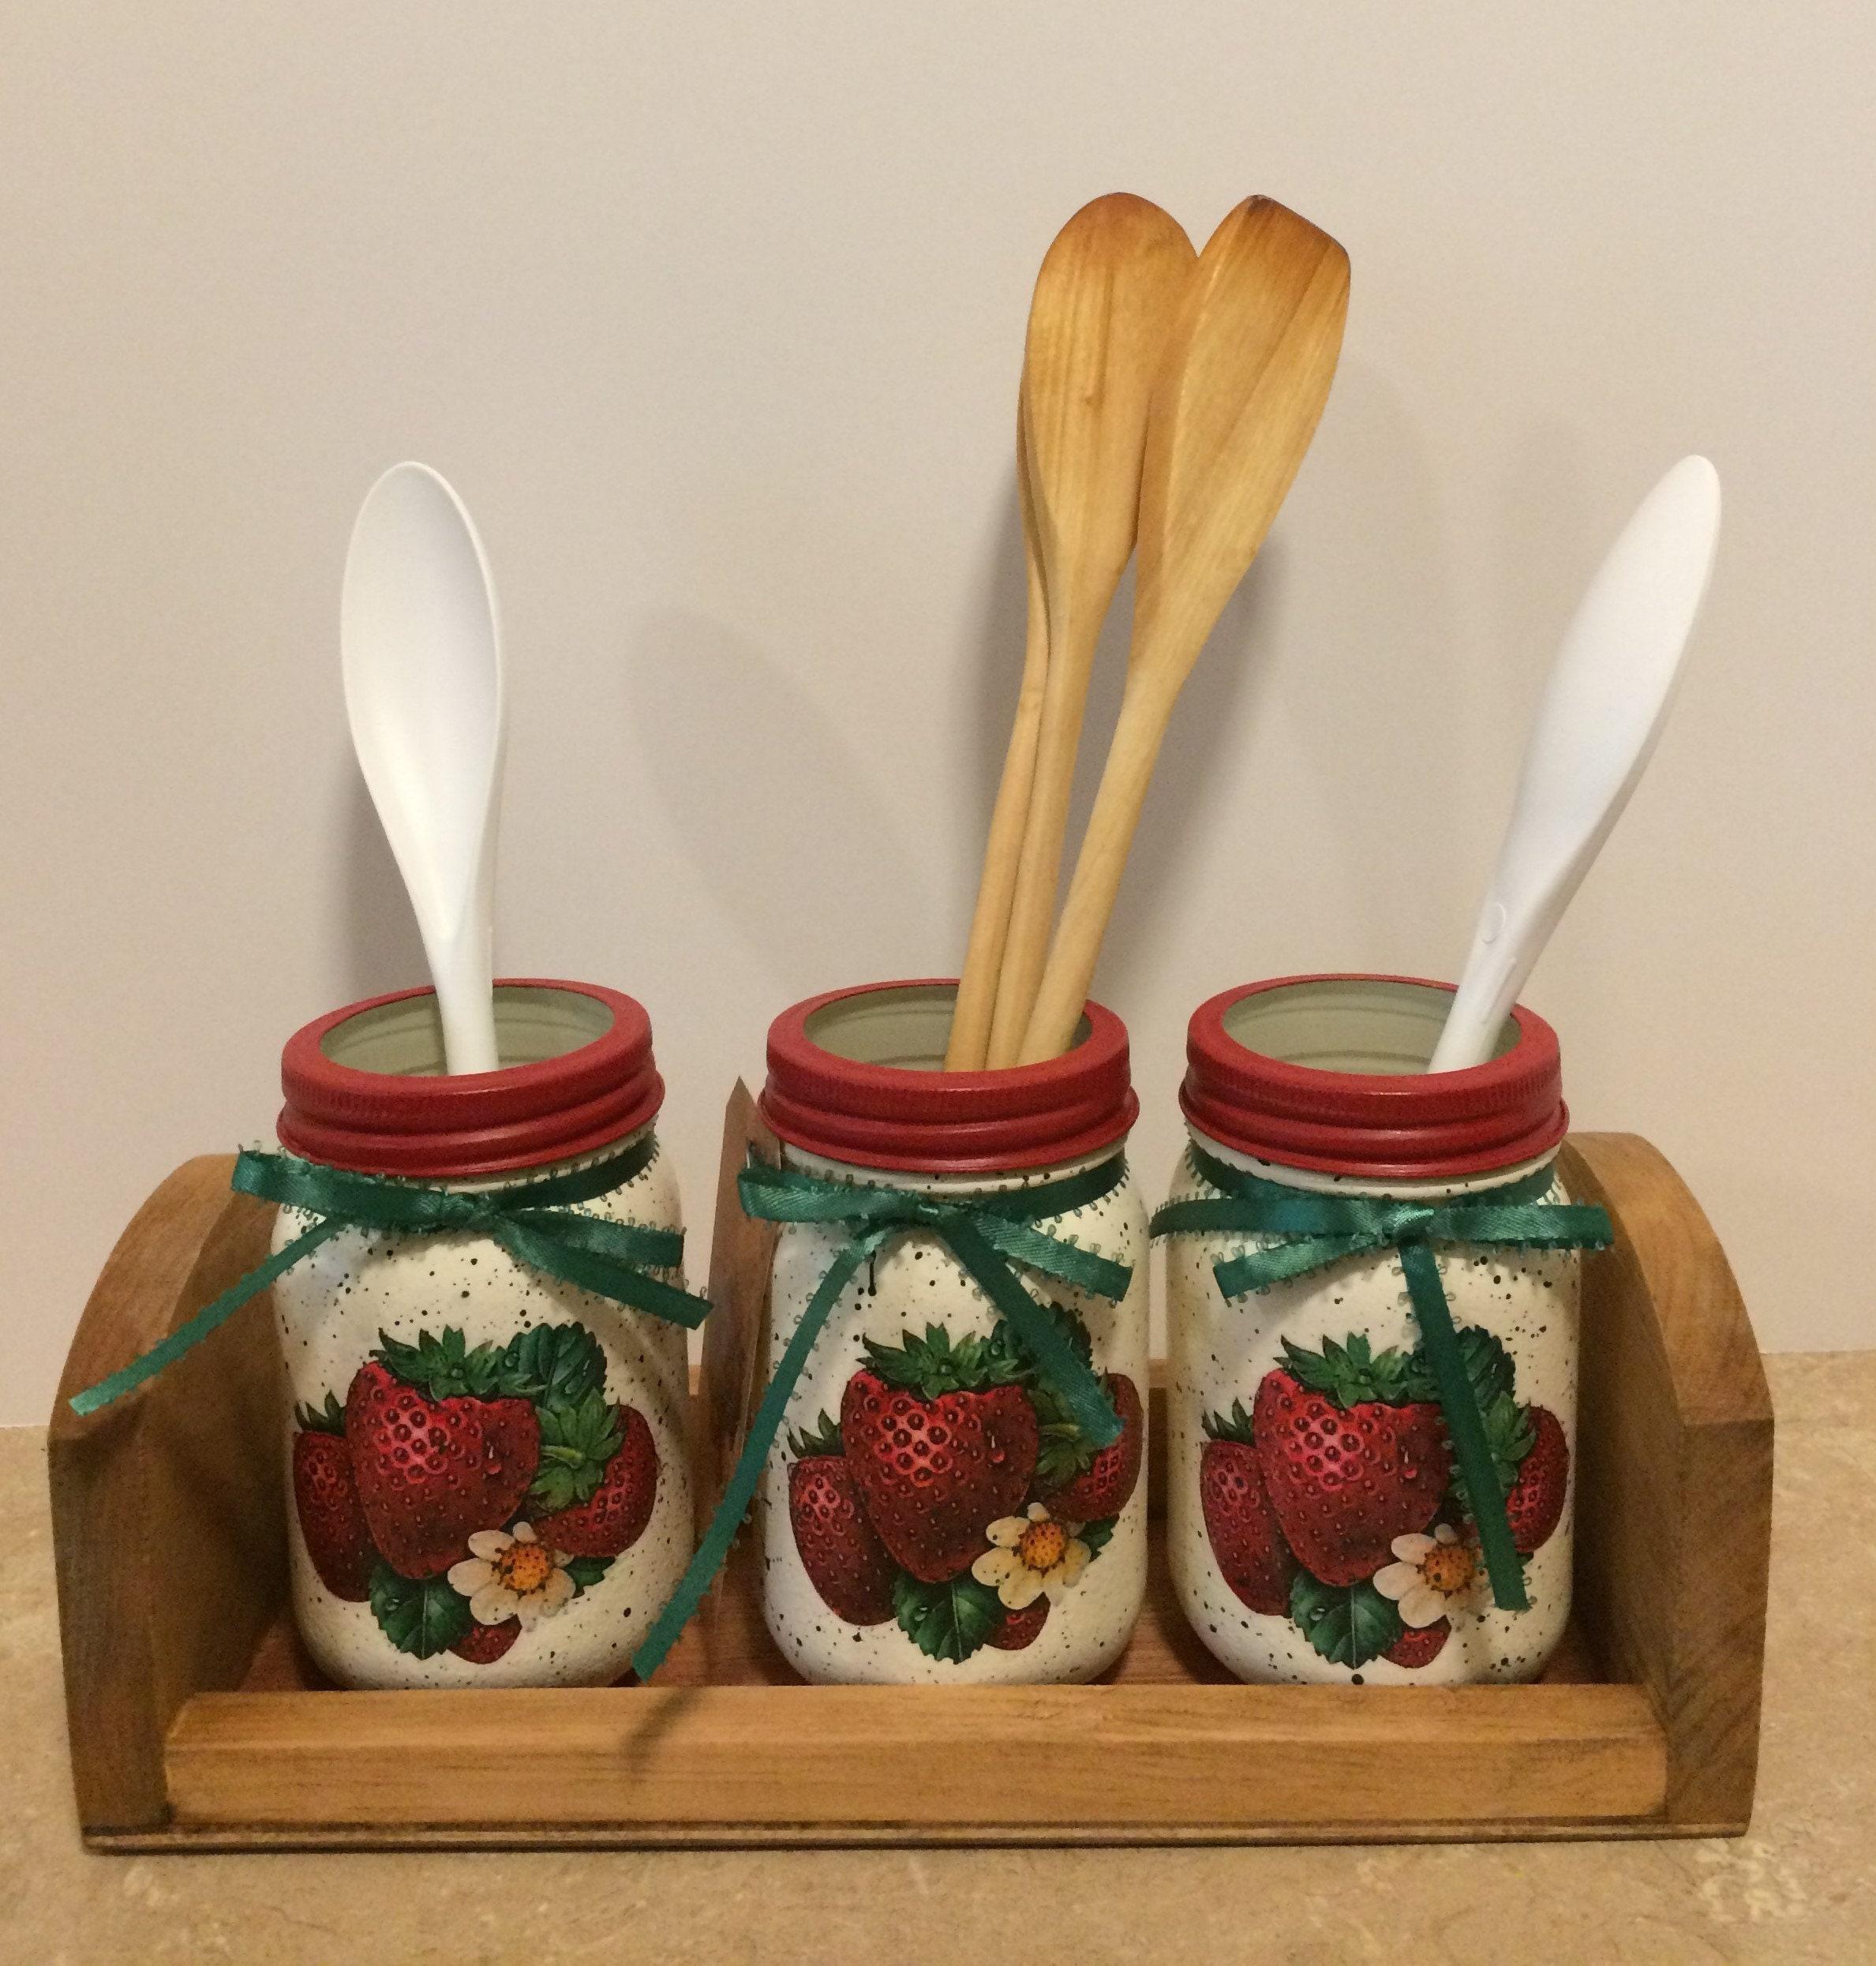 Mason Jar Utensil Holders Strawbery Kitchen Decor Strawberry Christmas Gift Country Decoupaged Jars